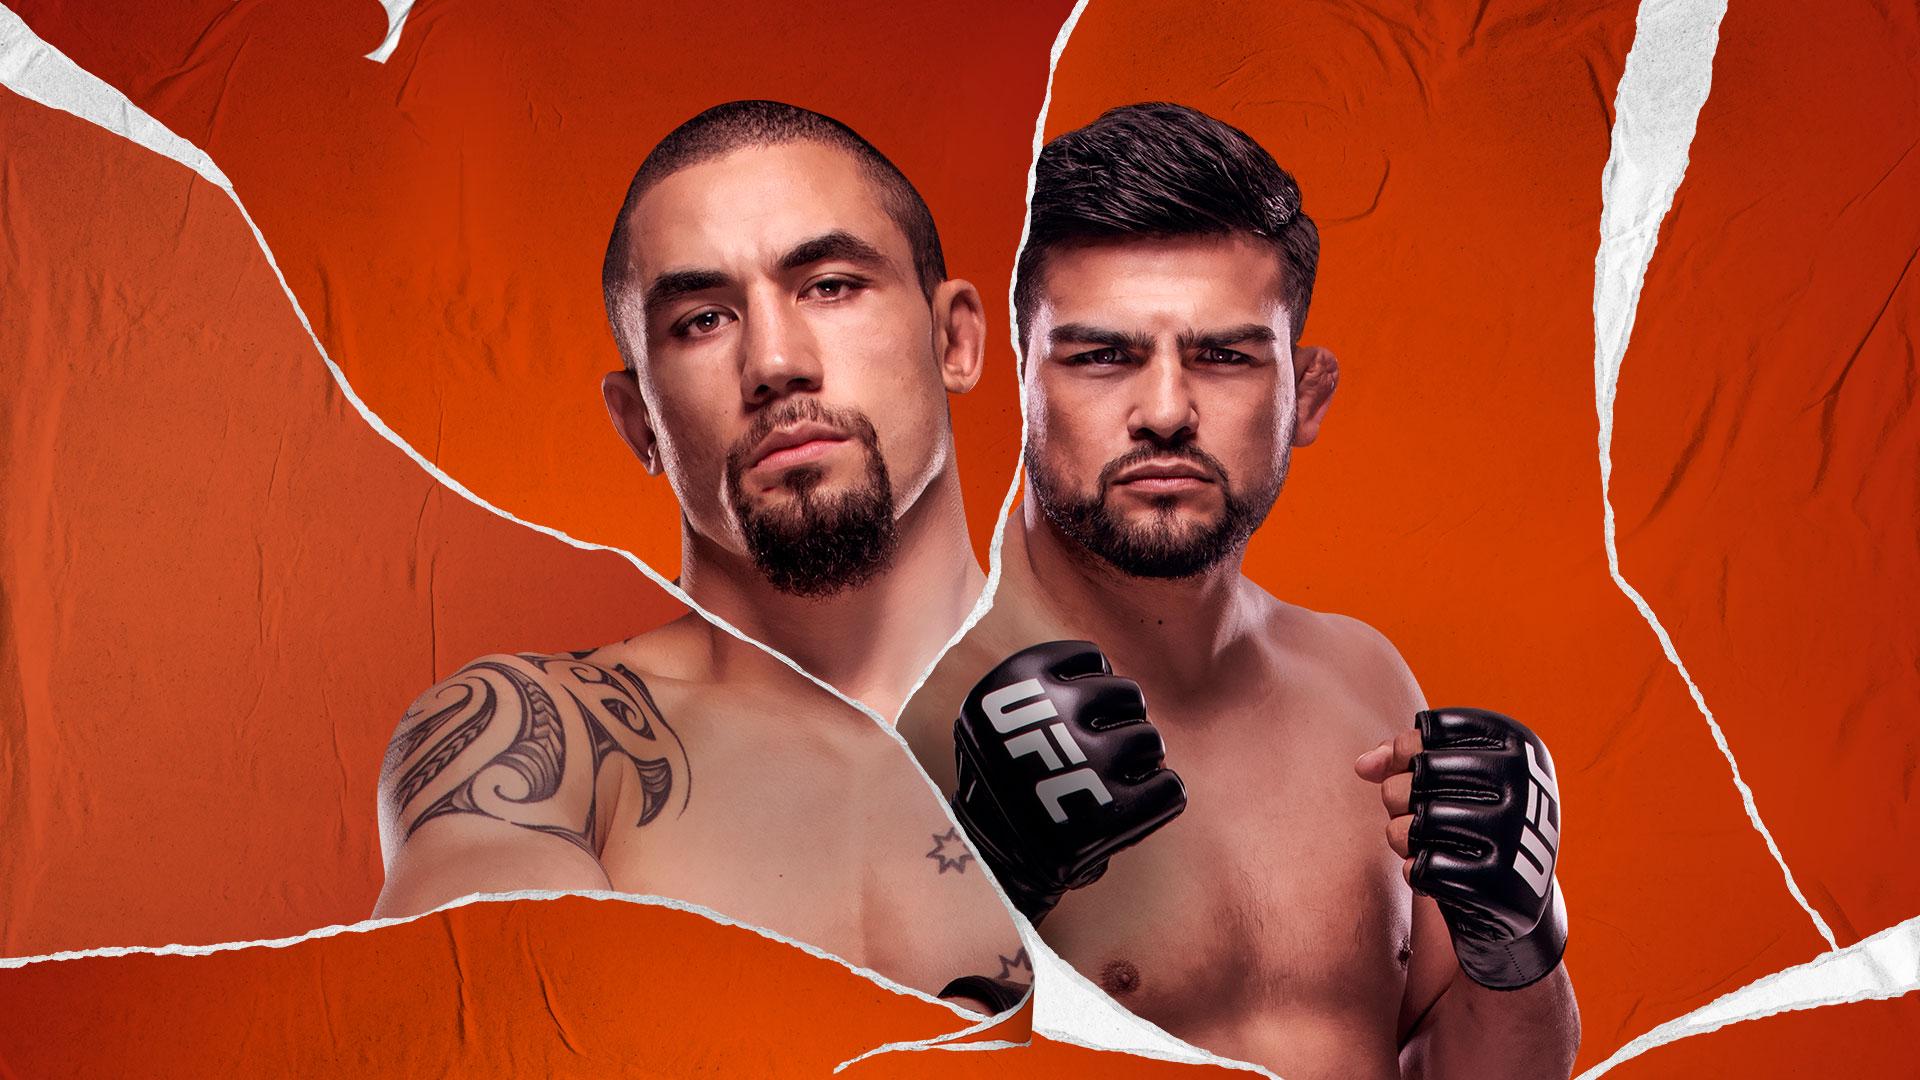 UFC VEGAS 24 ROBERT WHITTAKER VS KELVIN GASTELUM hero